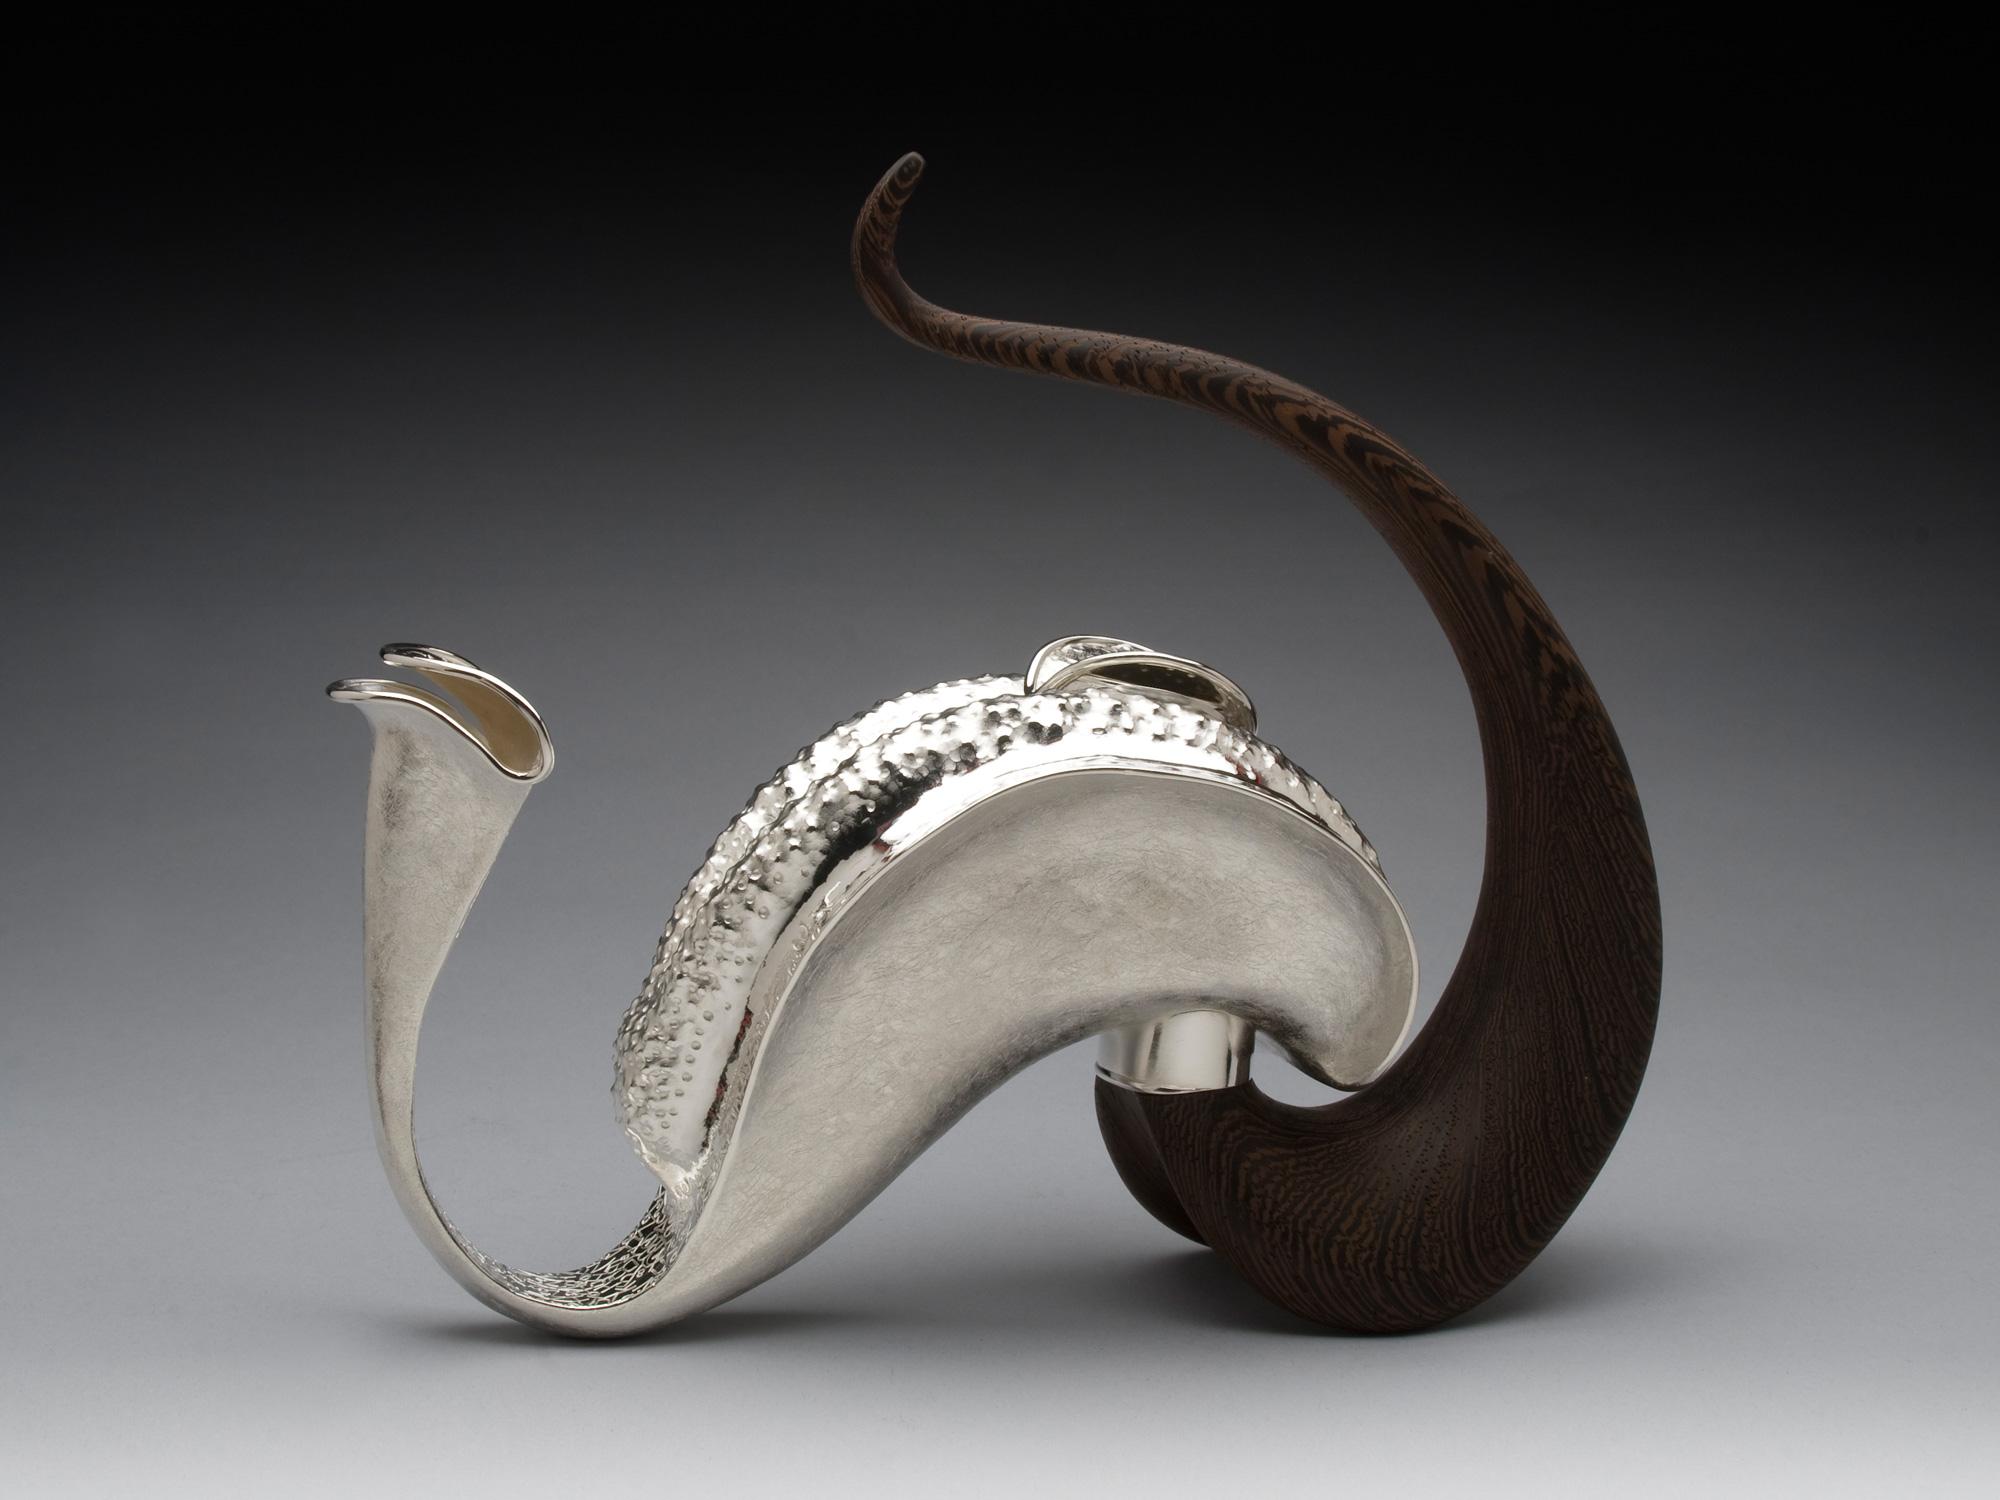 METALANGUAGE   Teapot | 2012 |  Mary Lynn Podiluk   Silver-plated copper, wenge wood, cork 18.5H x 21W x 7D cm